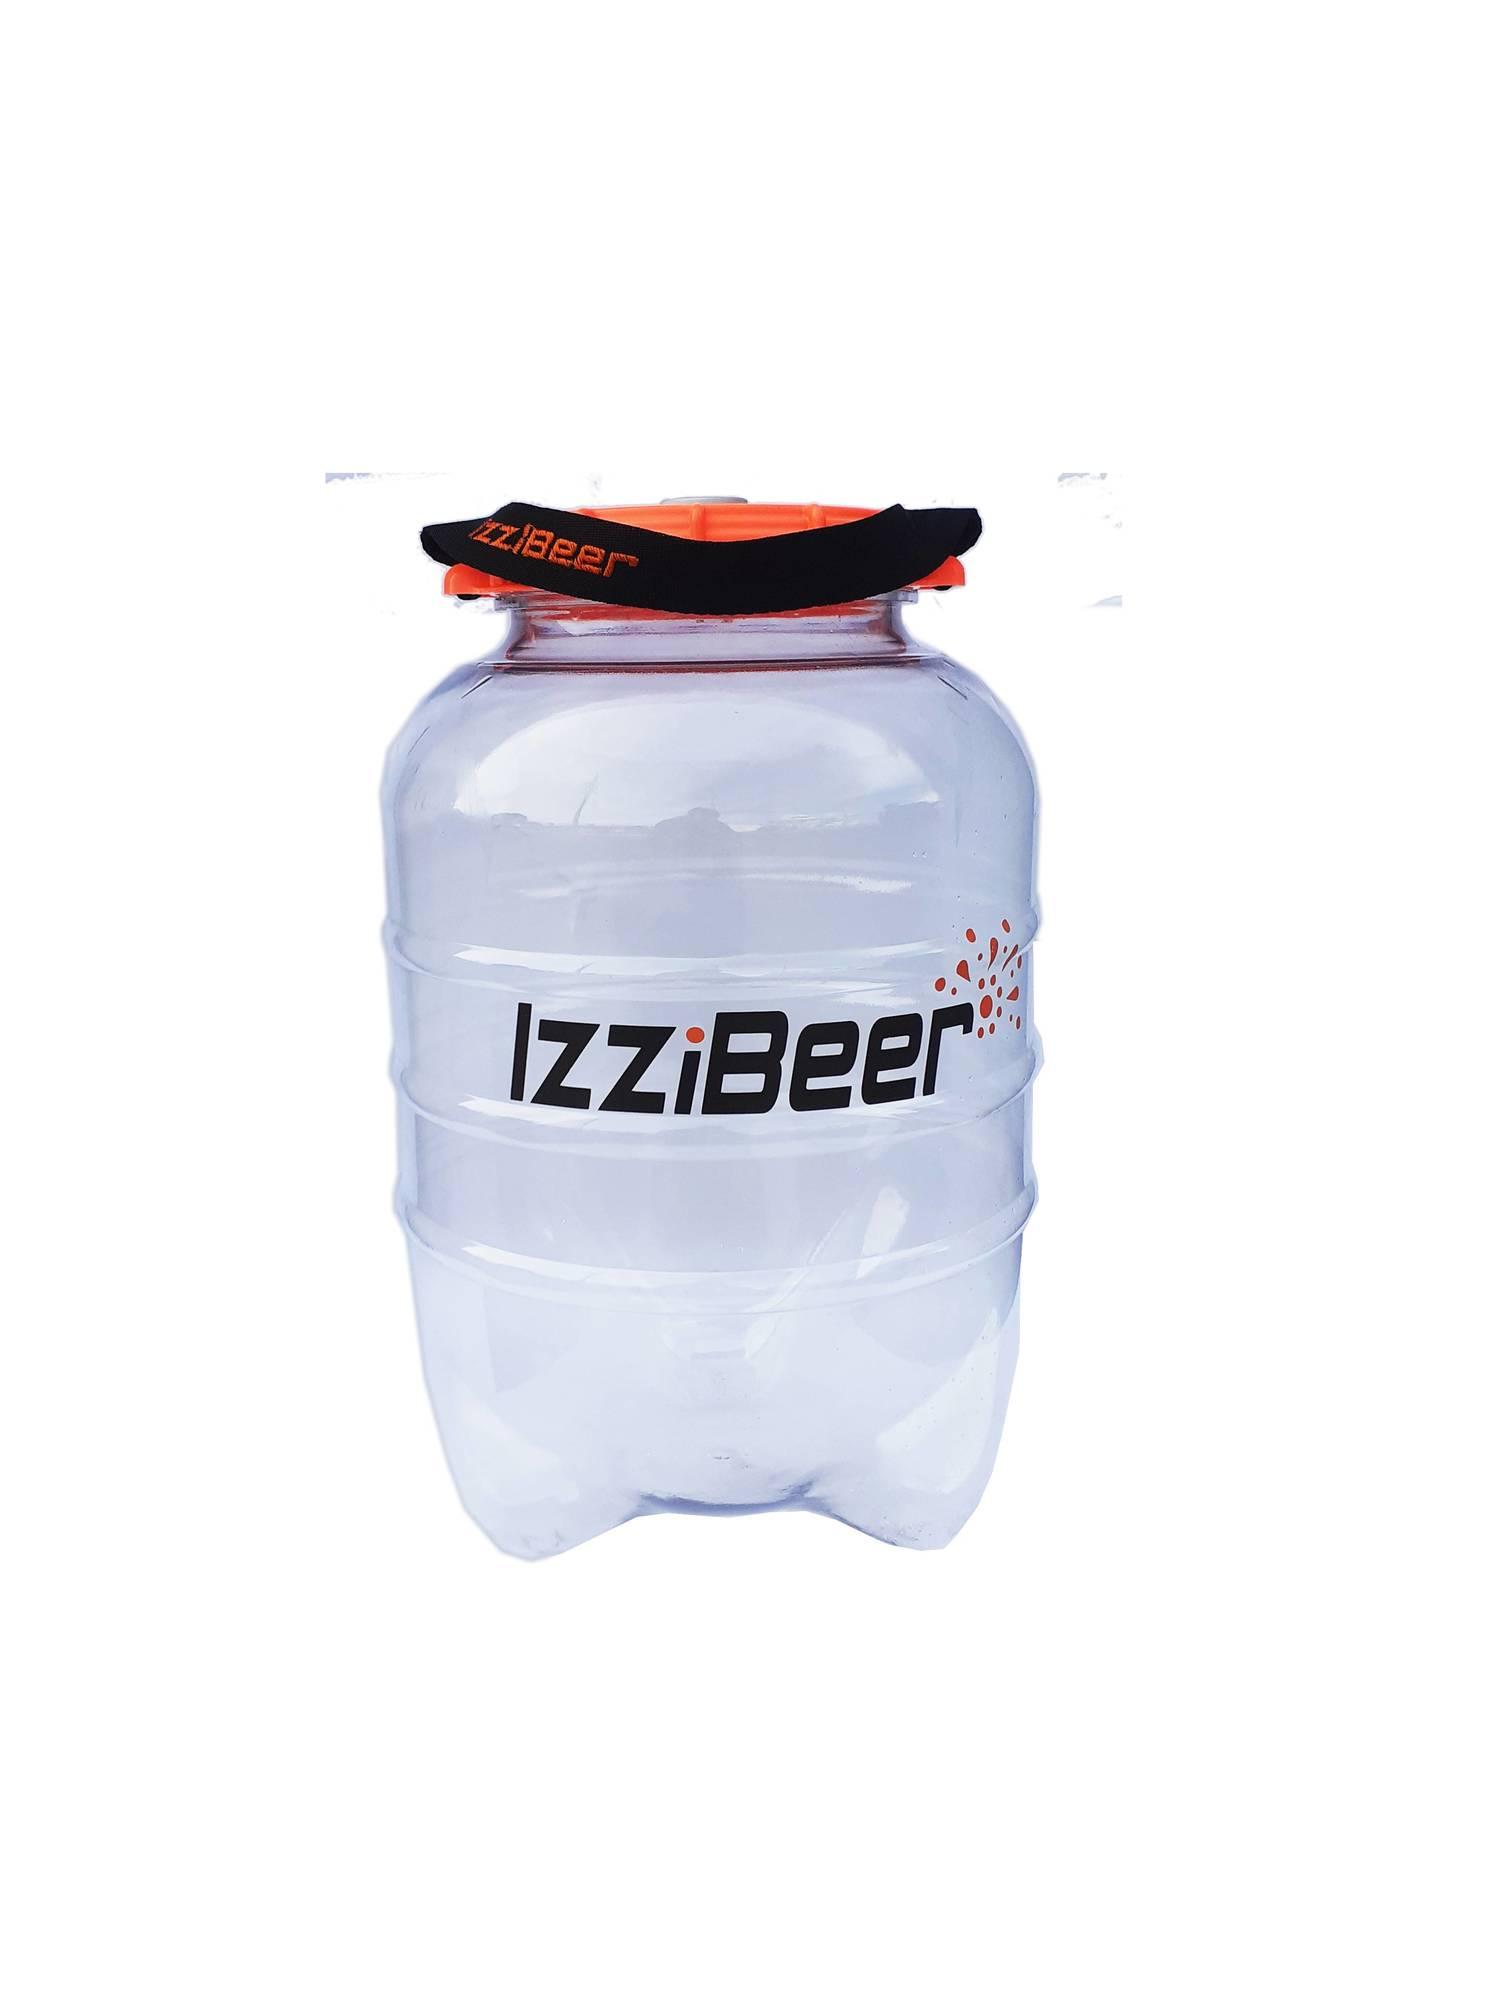 Fermentador Cerveja Artesanal Izzibeer Mini Basic 20 Litros